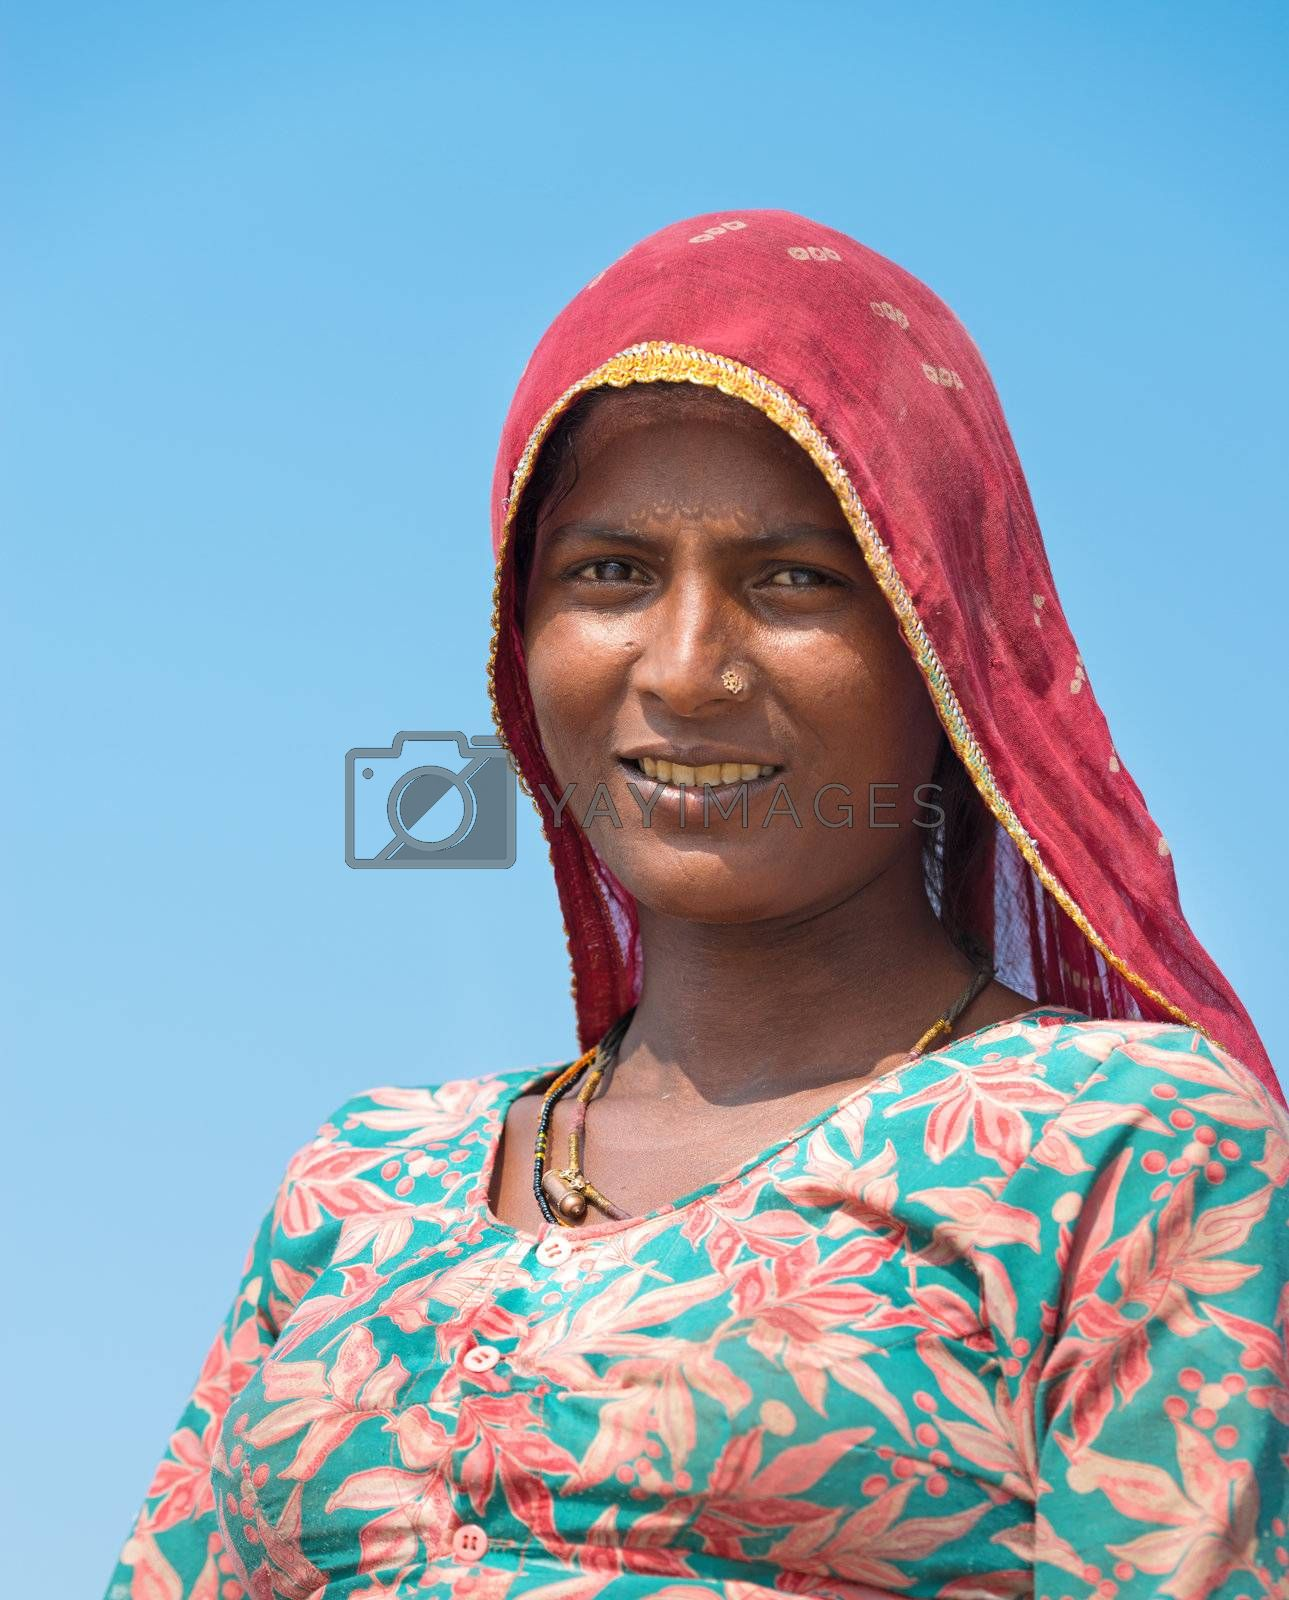 Sambhar, India - Nov 19: Portrait of indian female worker in salt farm on Nov 19, 2012 in Sambhar Salt Lake, India. It is India's largest saline lake and where salt has been farmed for a thousand years.